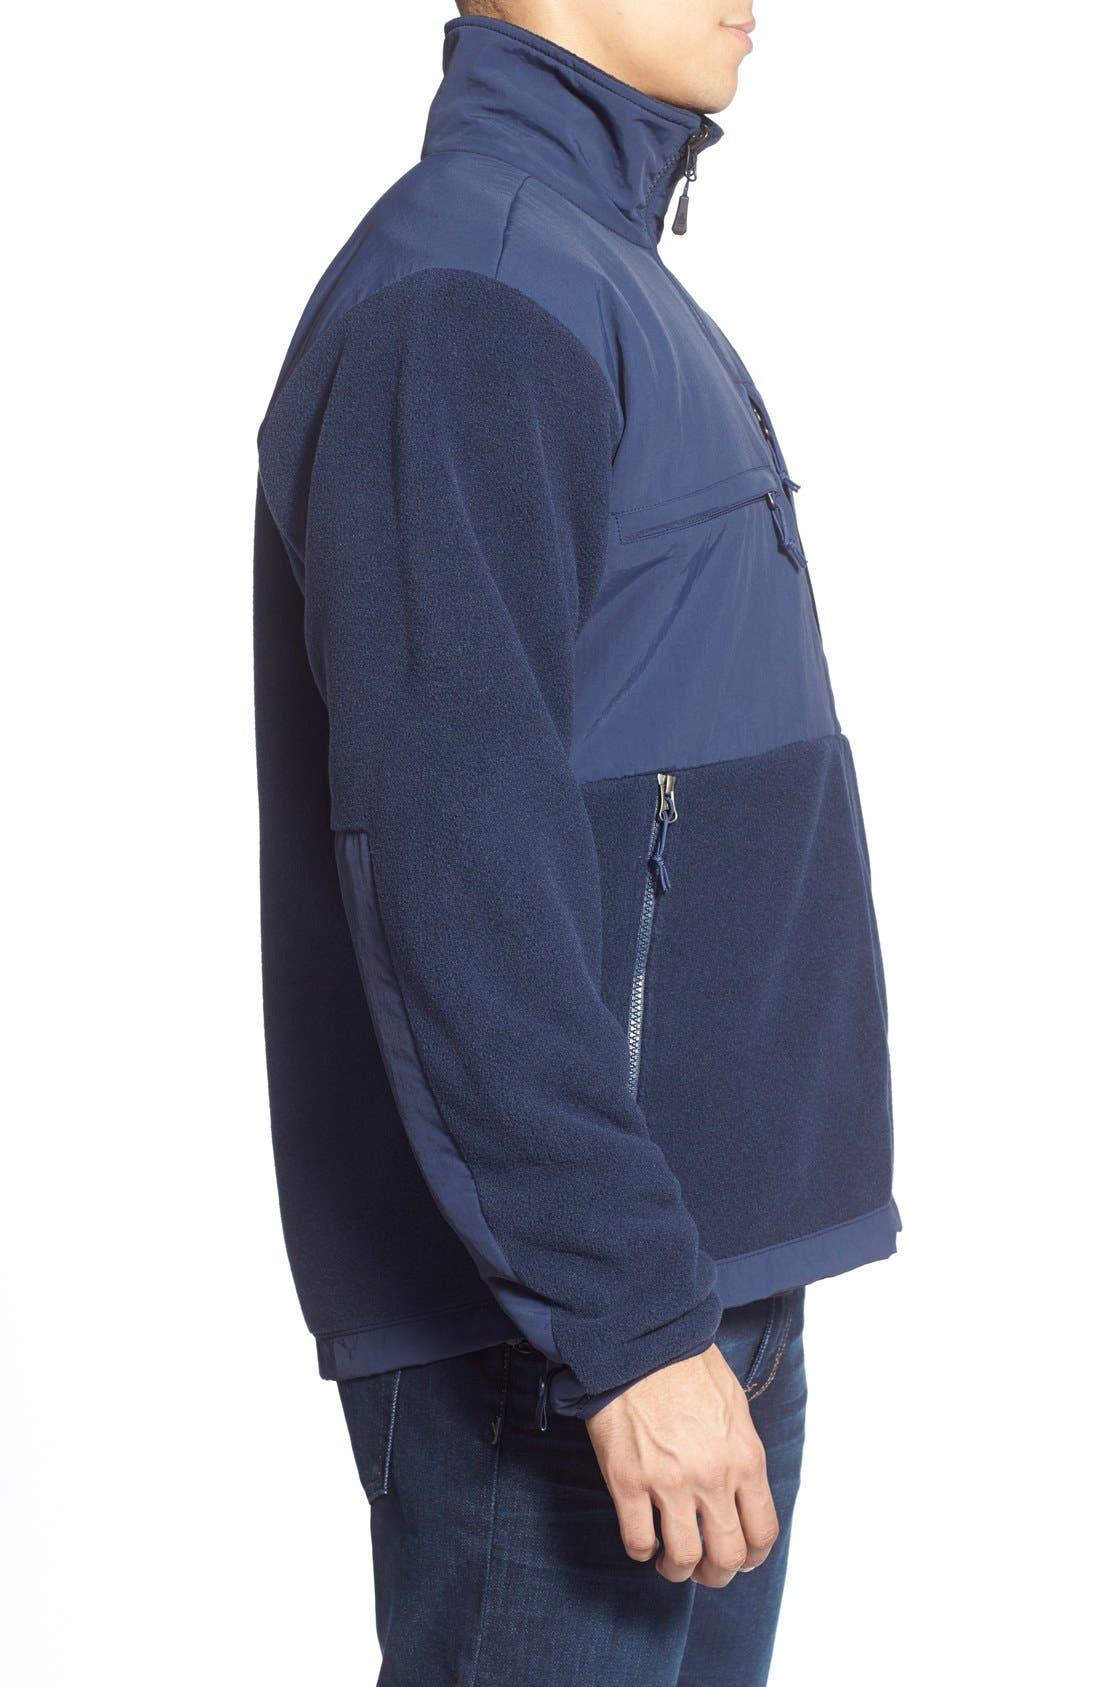 Alternate Image 3  - The North Face 'Denali' Recycled Polartec 300® Fleece Jacket